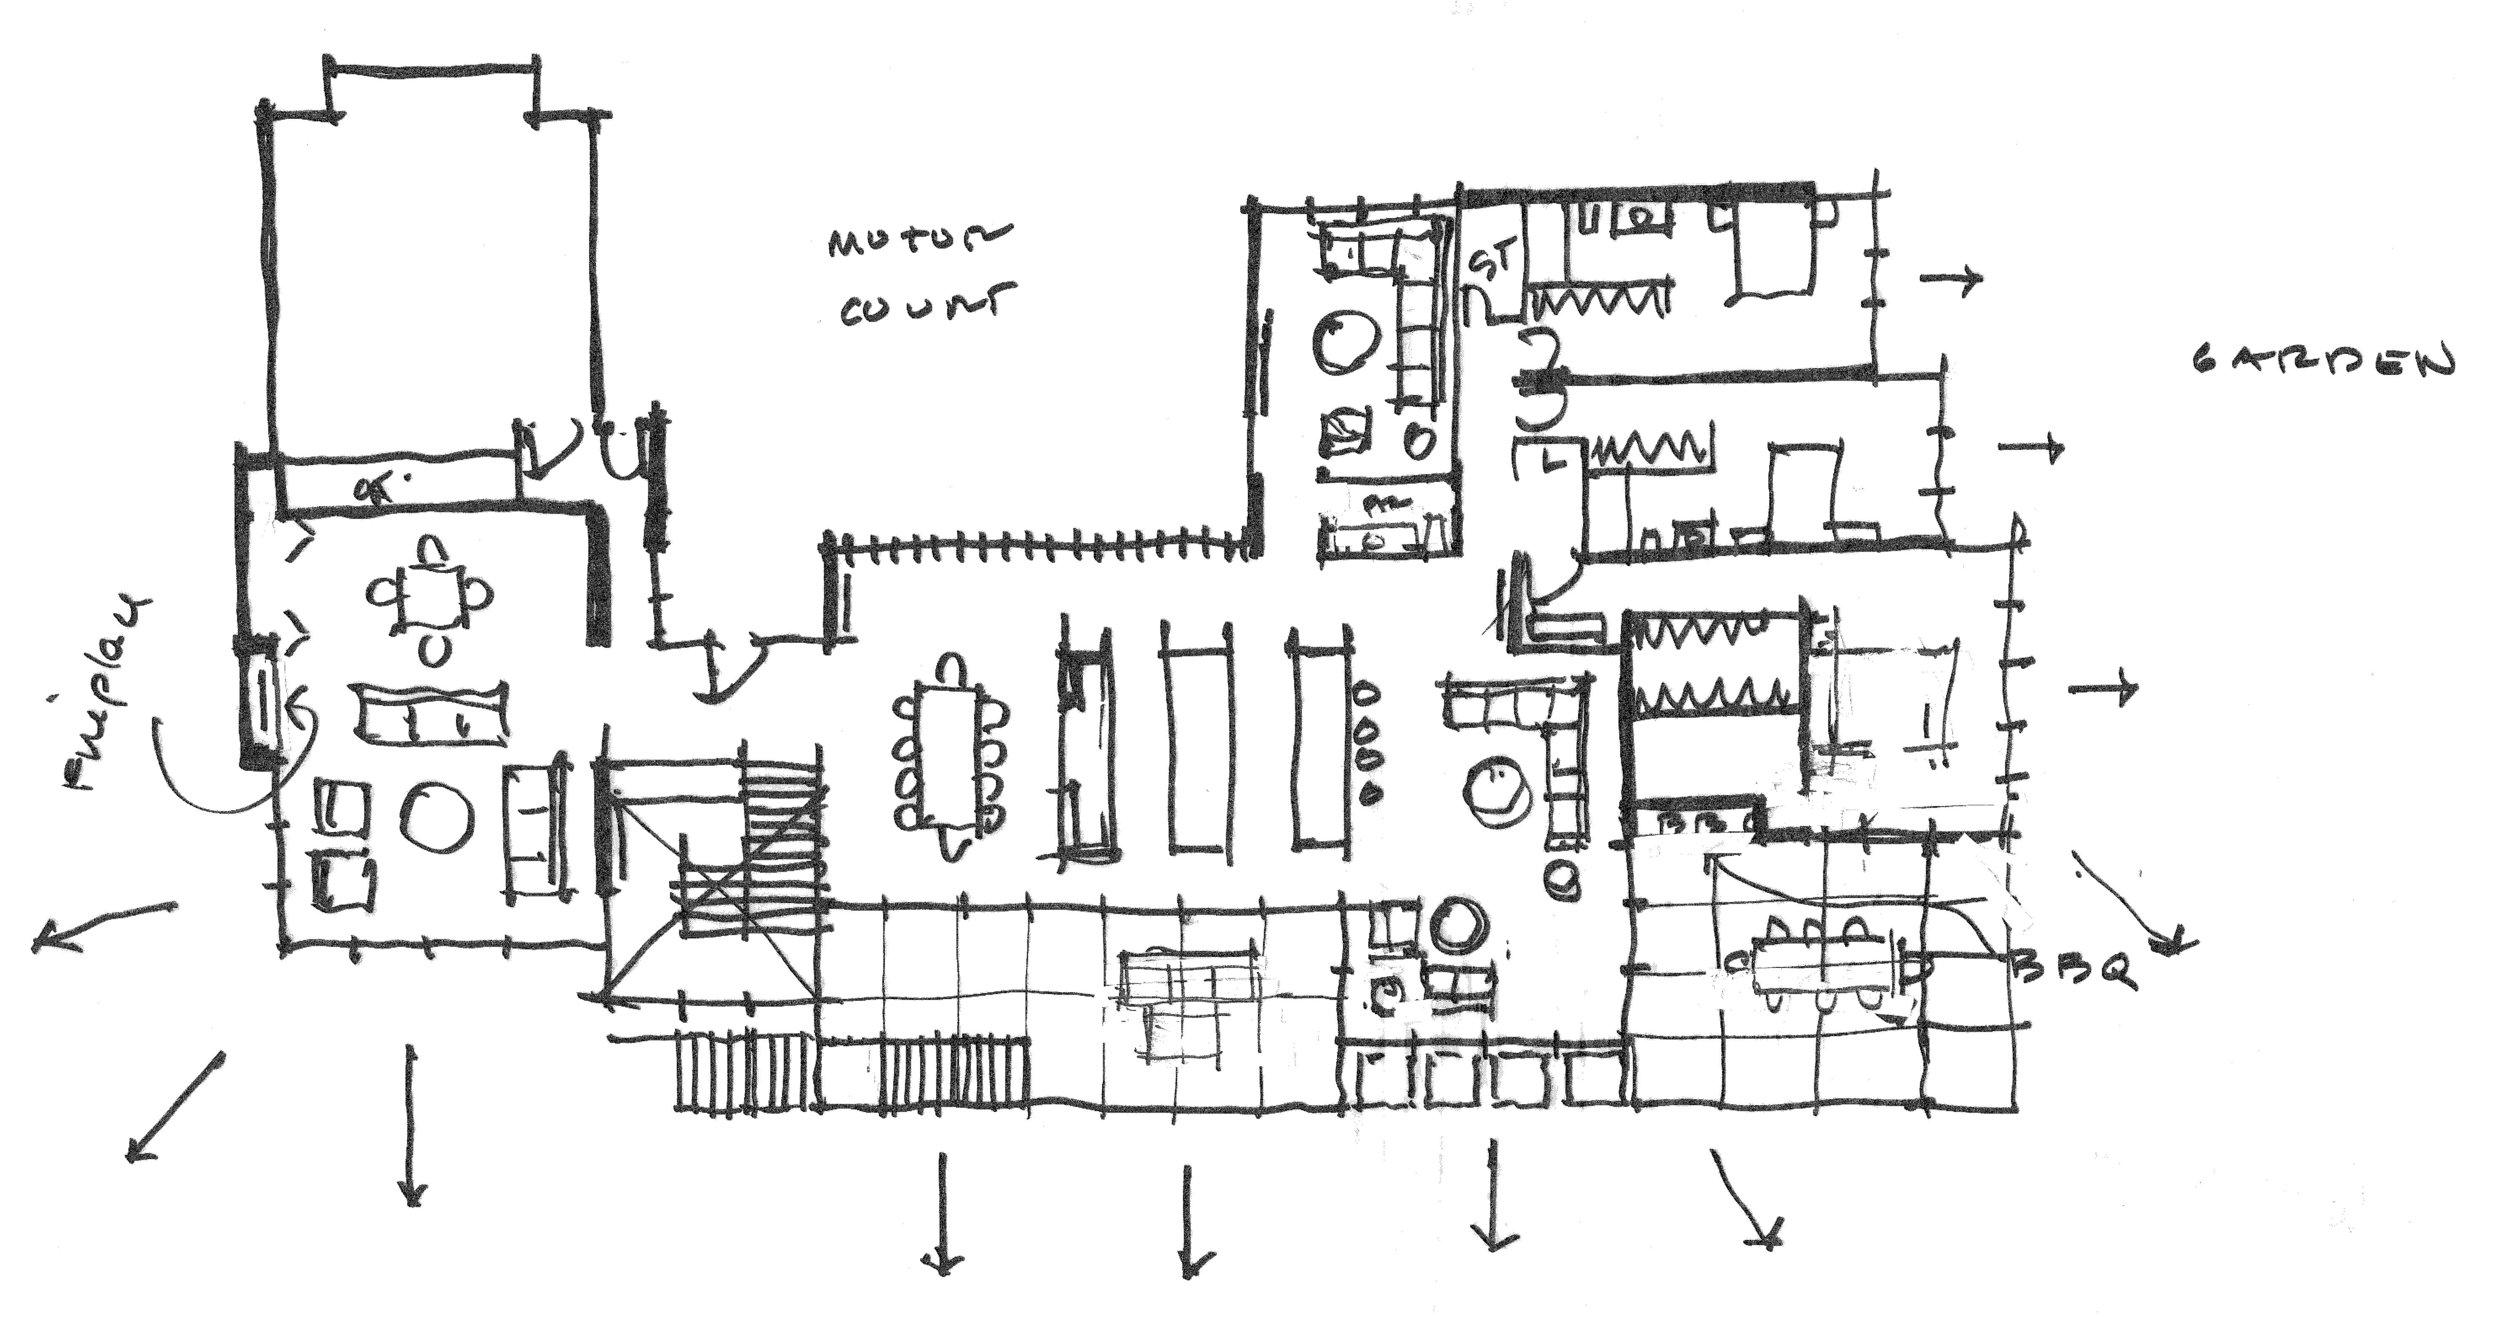 1216-InitialSketch_2013.jpg